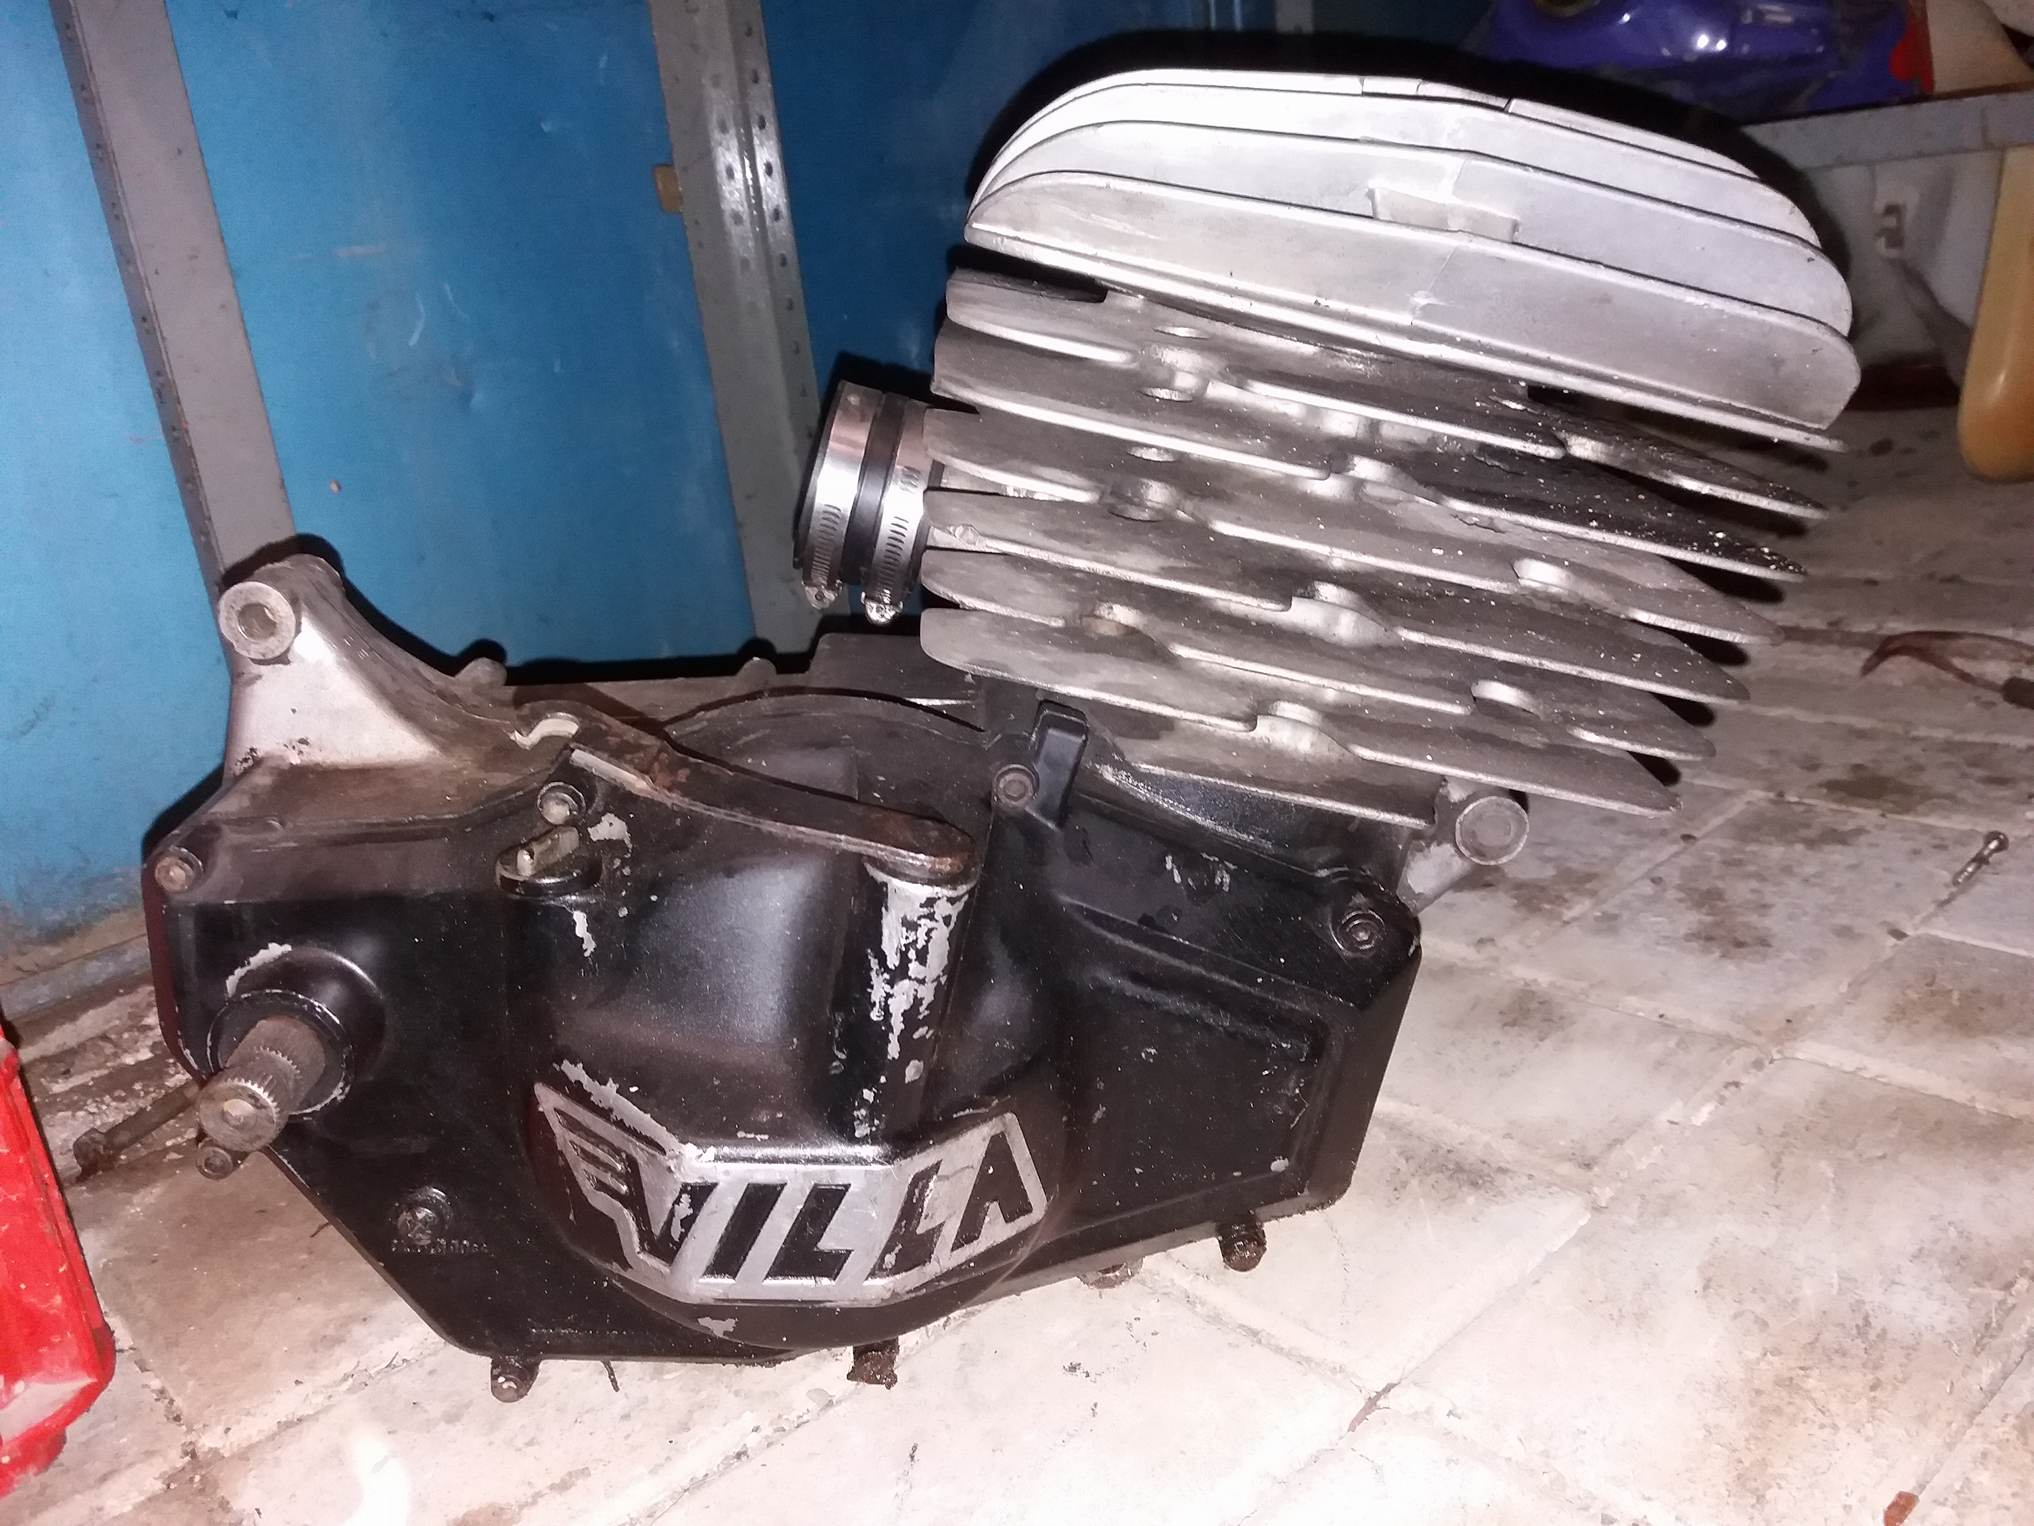 Blocco motore villa fv 250